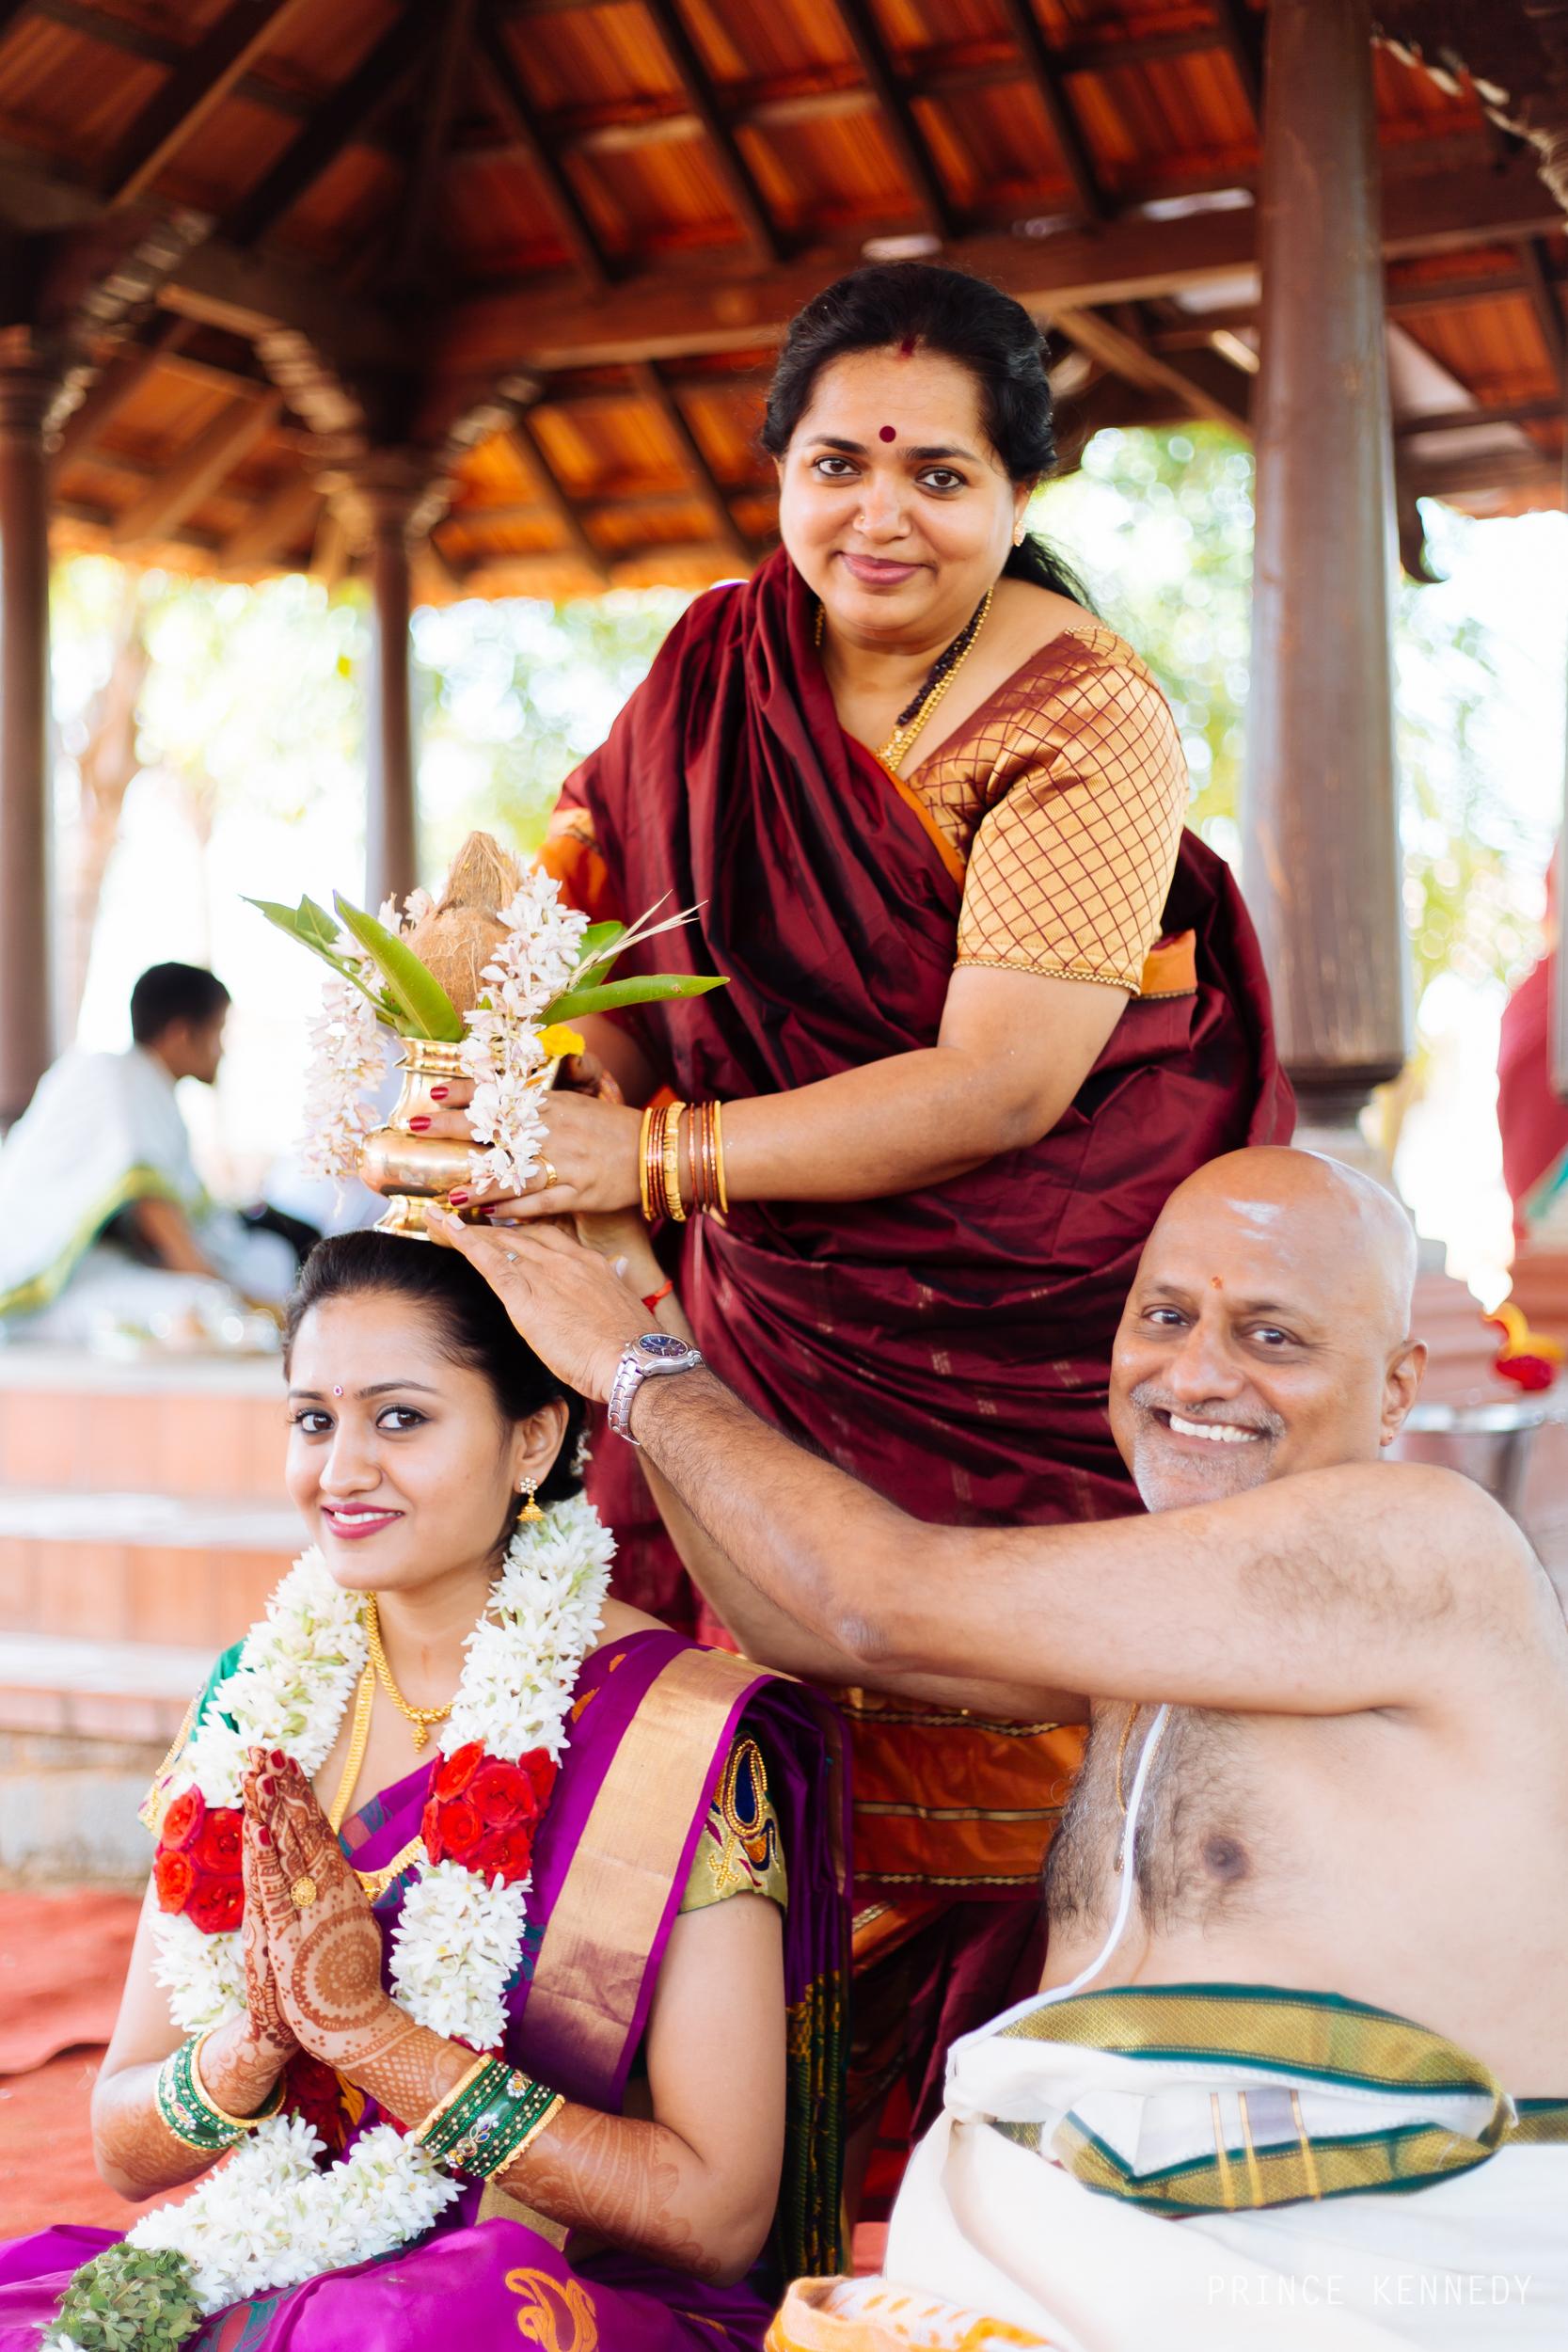 Athmajja-Nithesh-Engagement-Couple-Portrait-Portraiture-Wedding-Couple-Portrait-Chennai-Photographer-Candid-Photography-Destination-Best-Prince-Kennedy-Photography-49.jpg